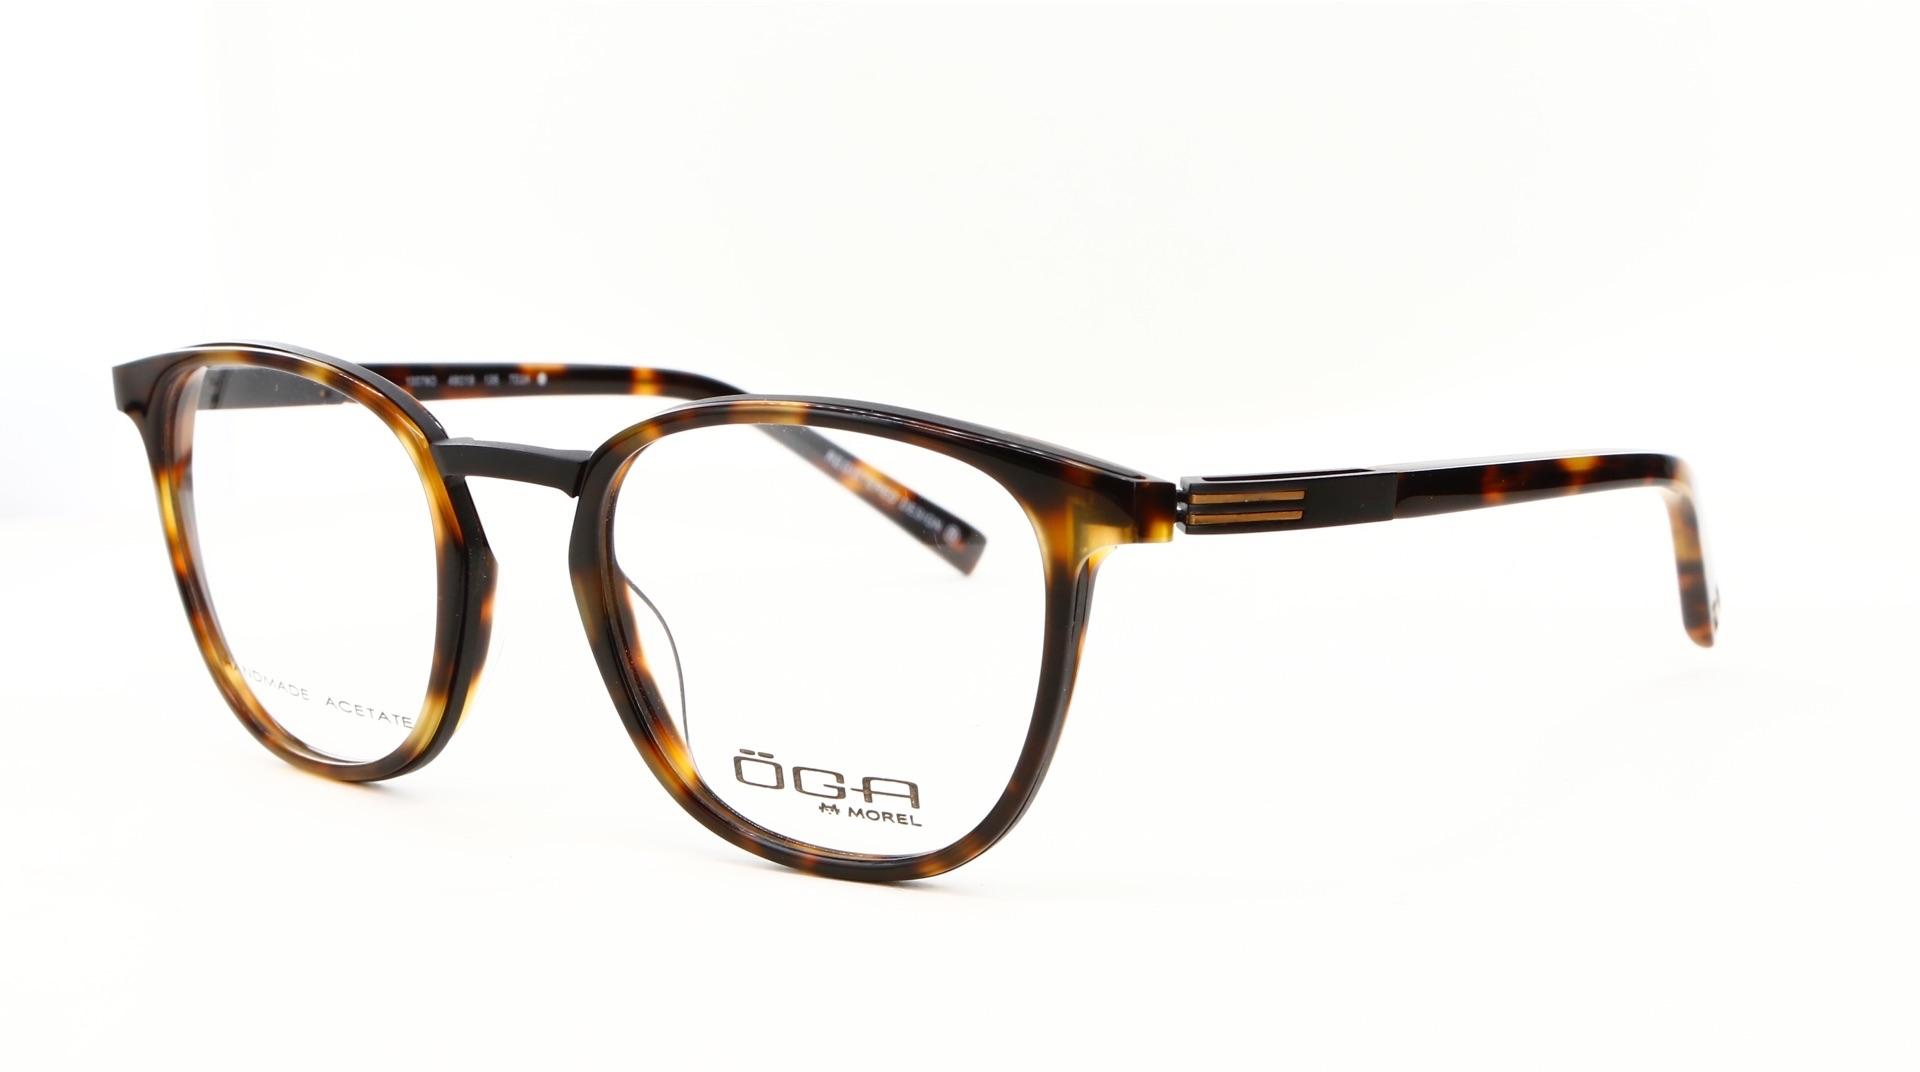 OGA - ref: 80590